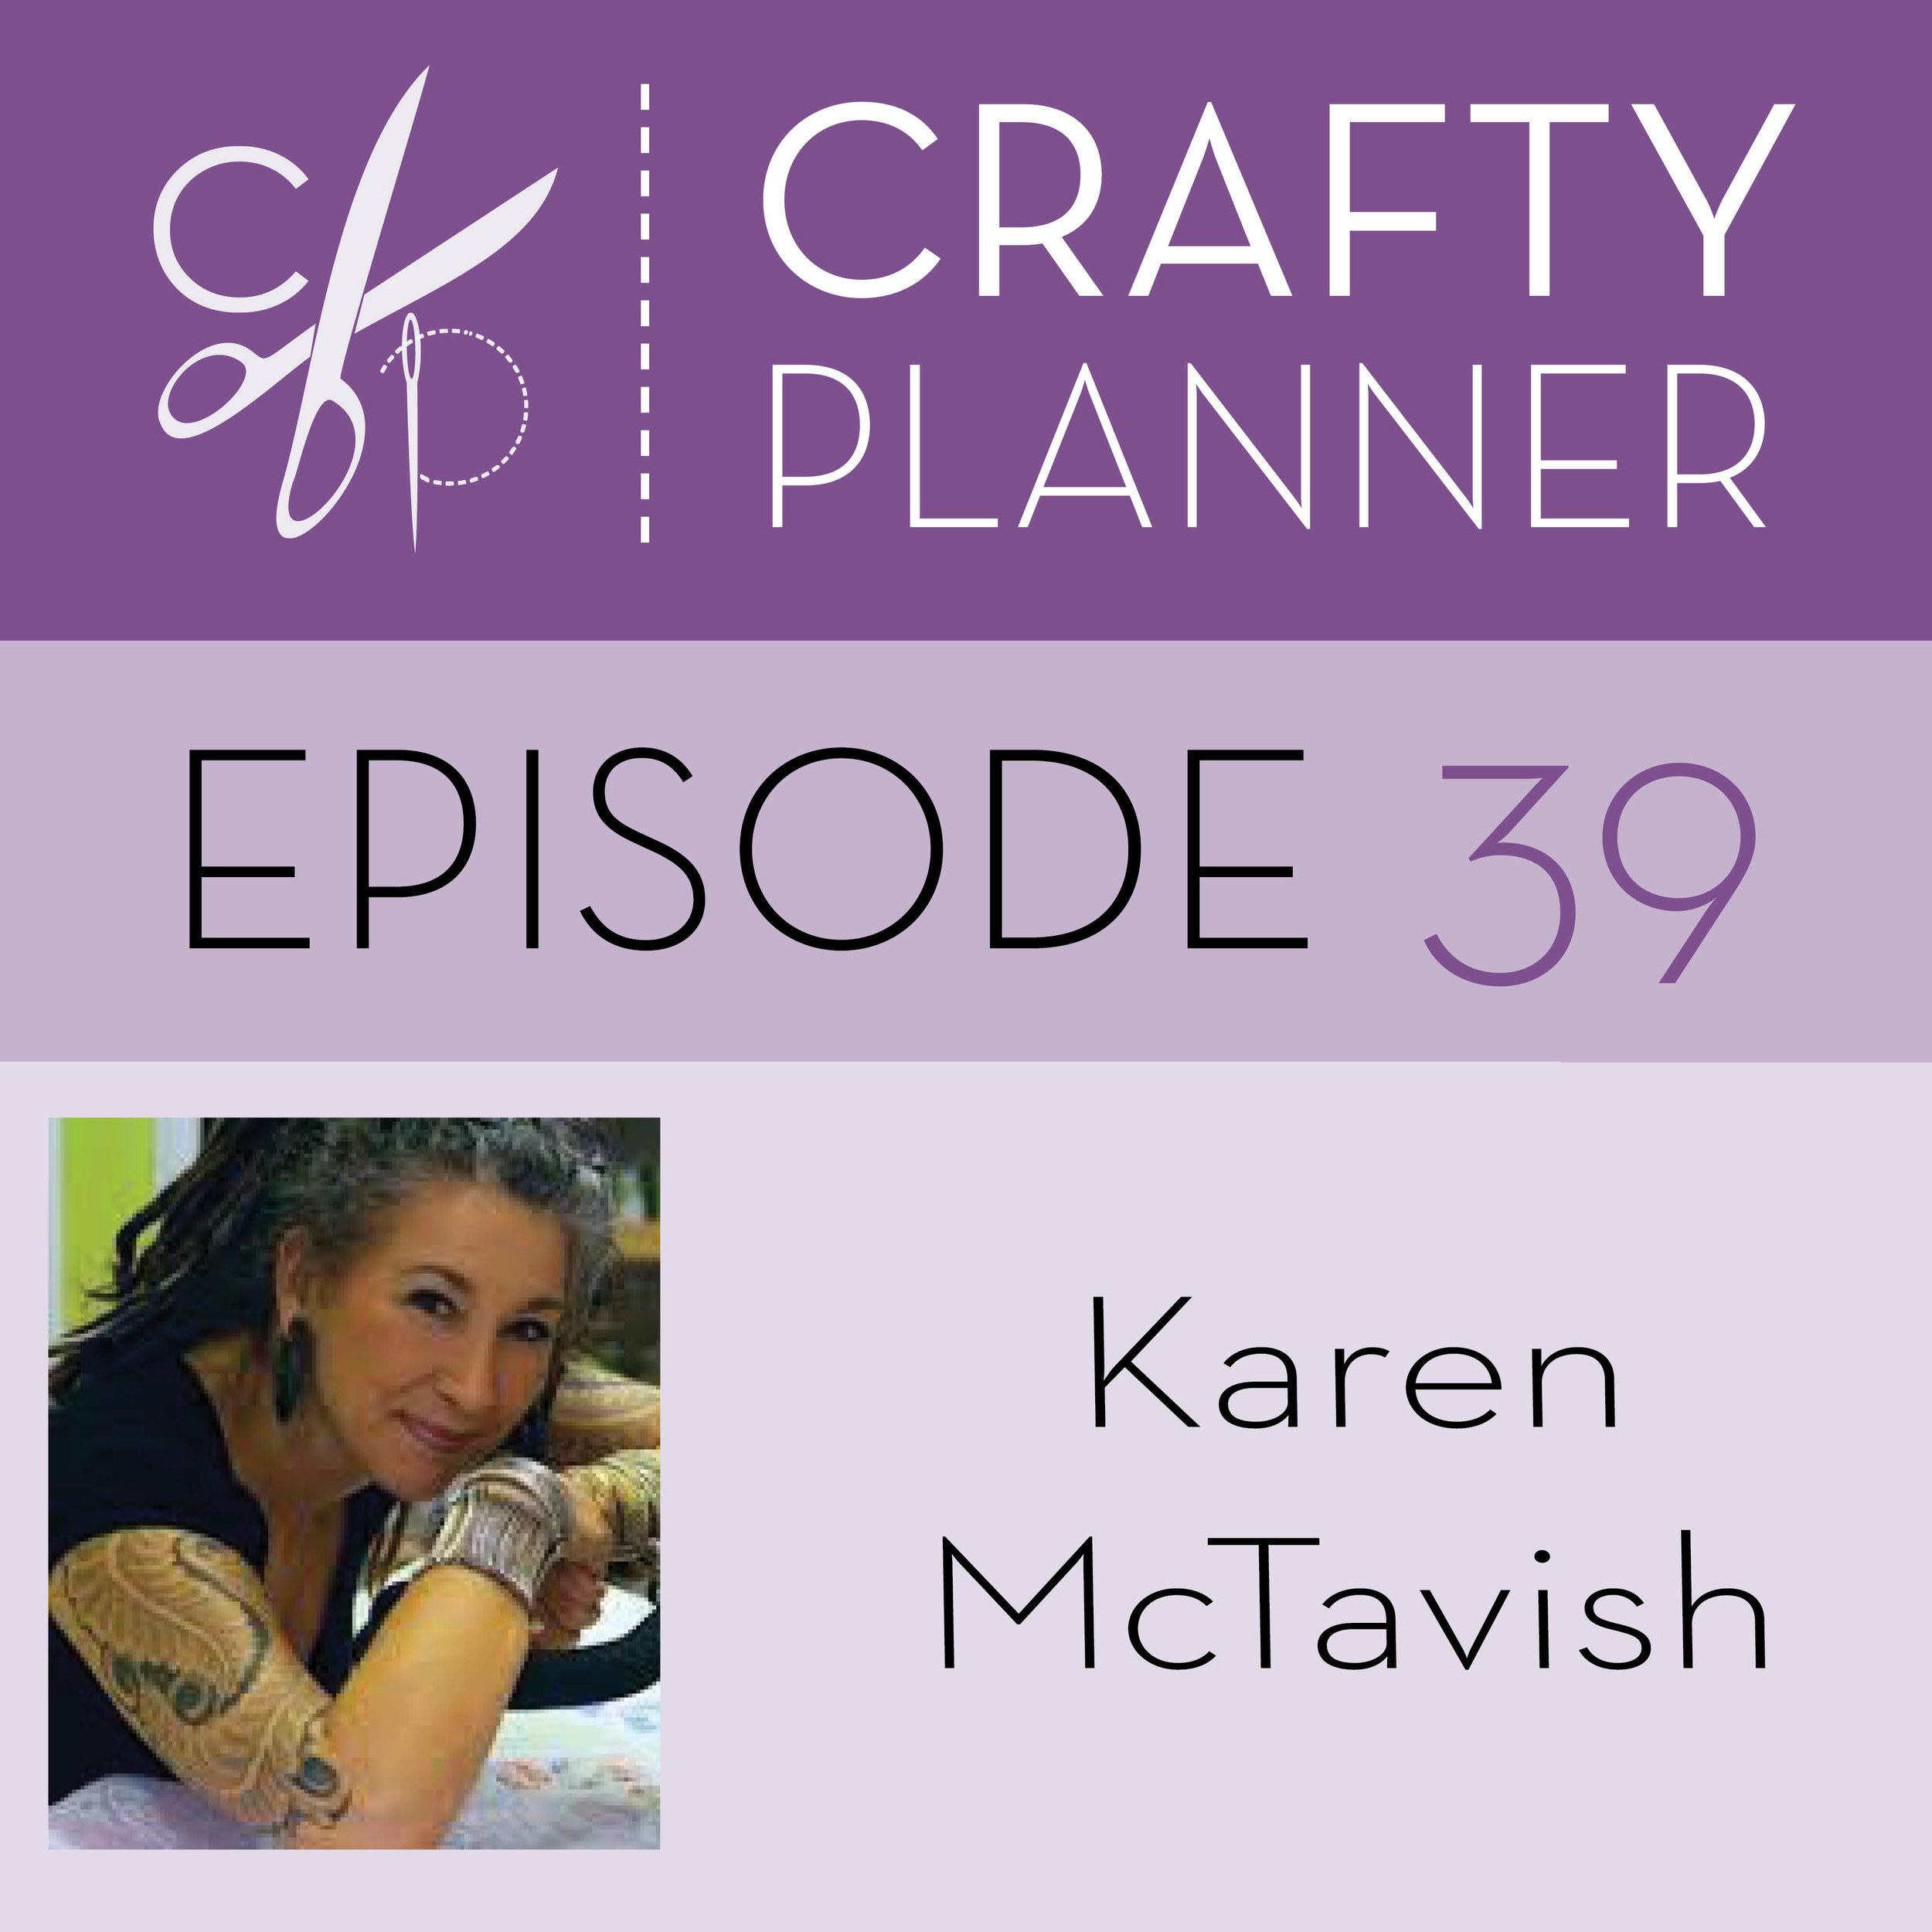 Karen-McTavish-Graphic.jpg